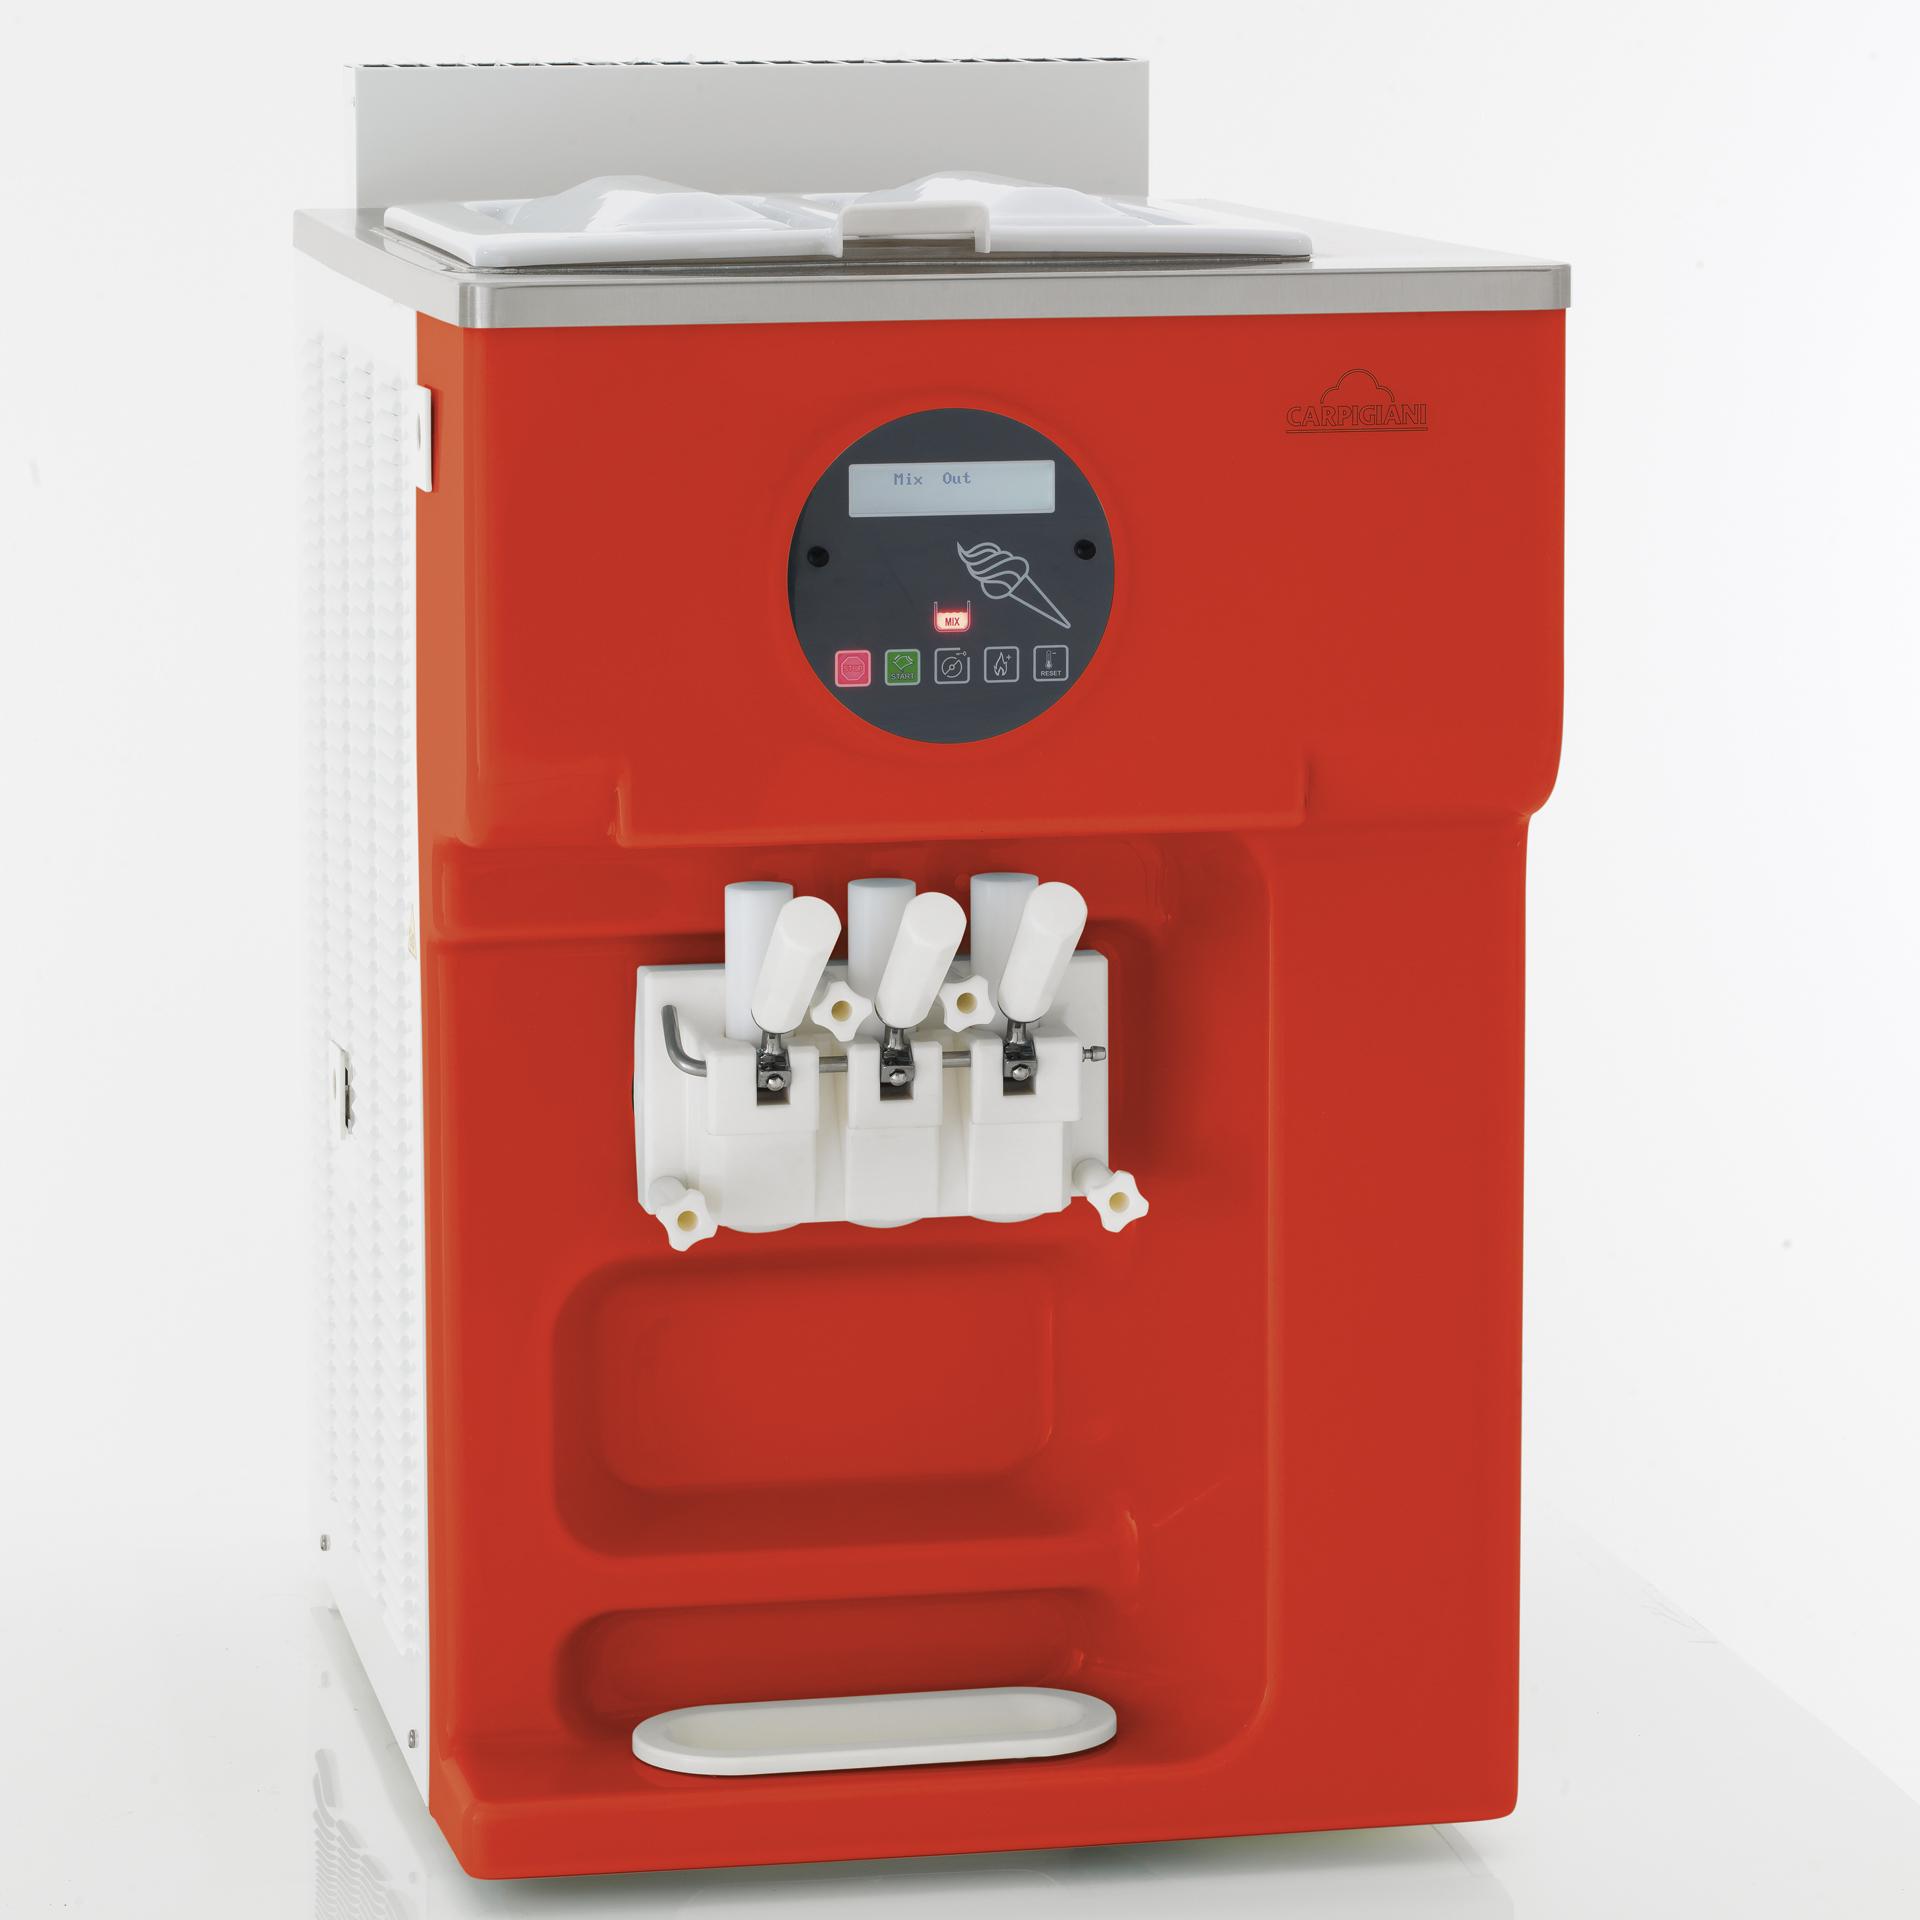 Carpigiani Soft Serve Machine - Only You Personalization